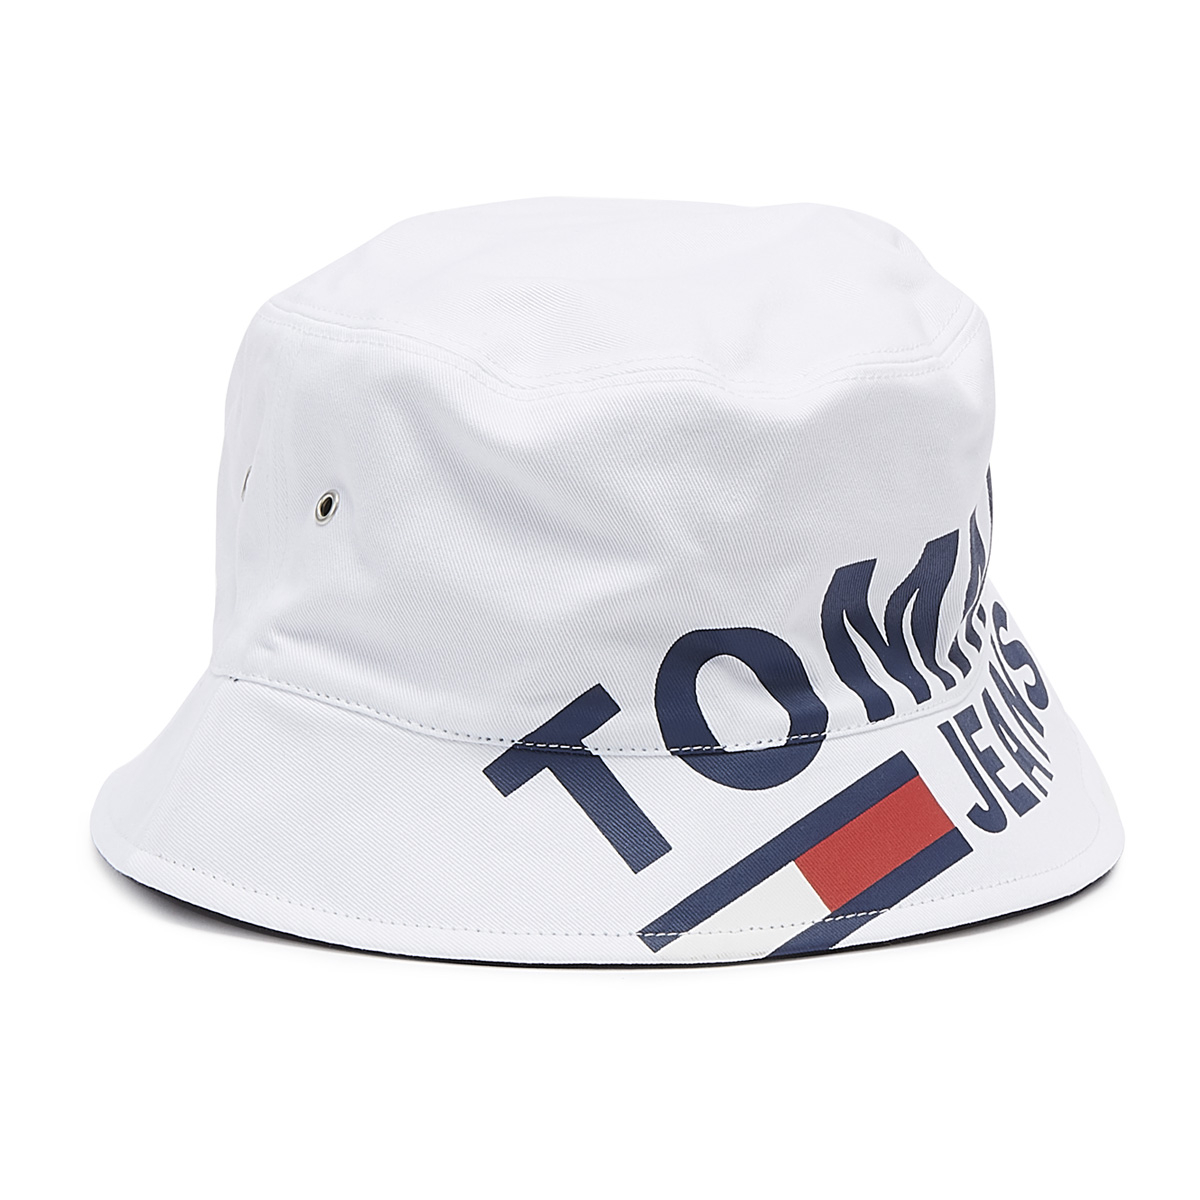 ecb1a9db0a9 Tommy Jeans TJU Logo White Bucket Hat 8719857077128